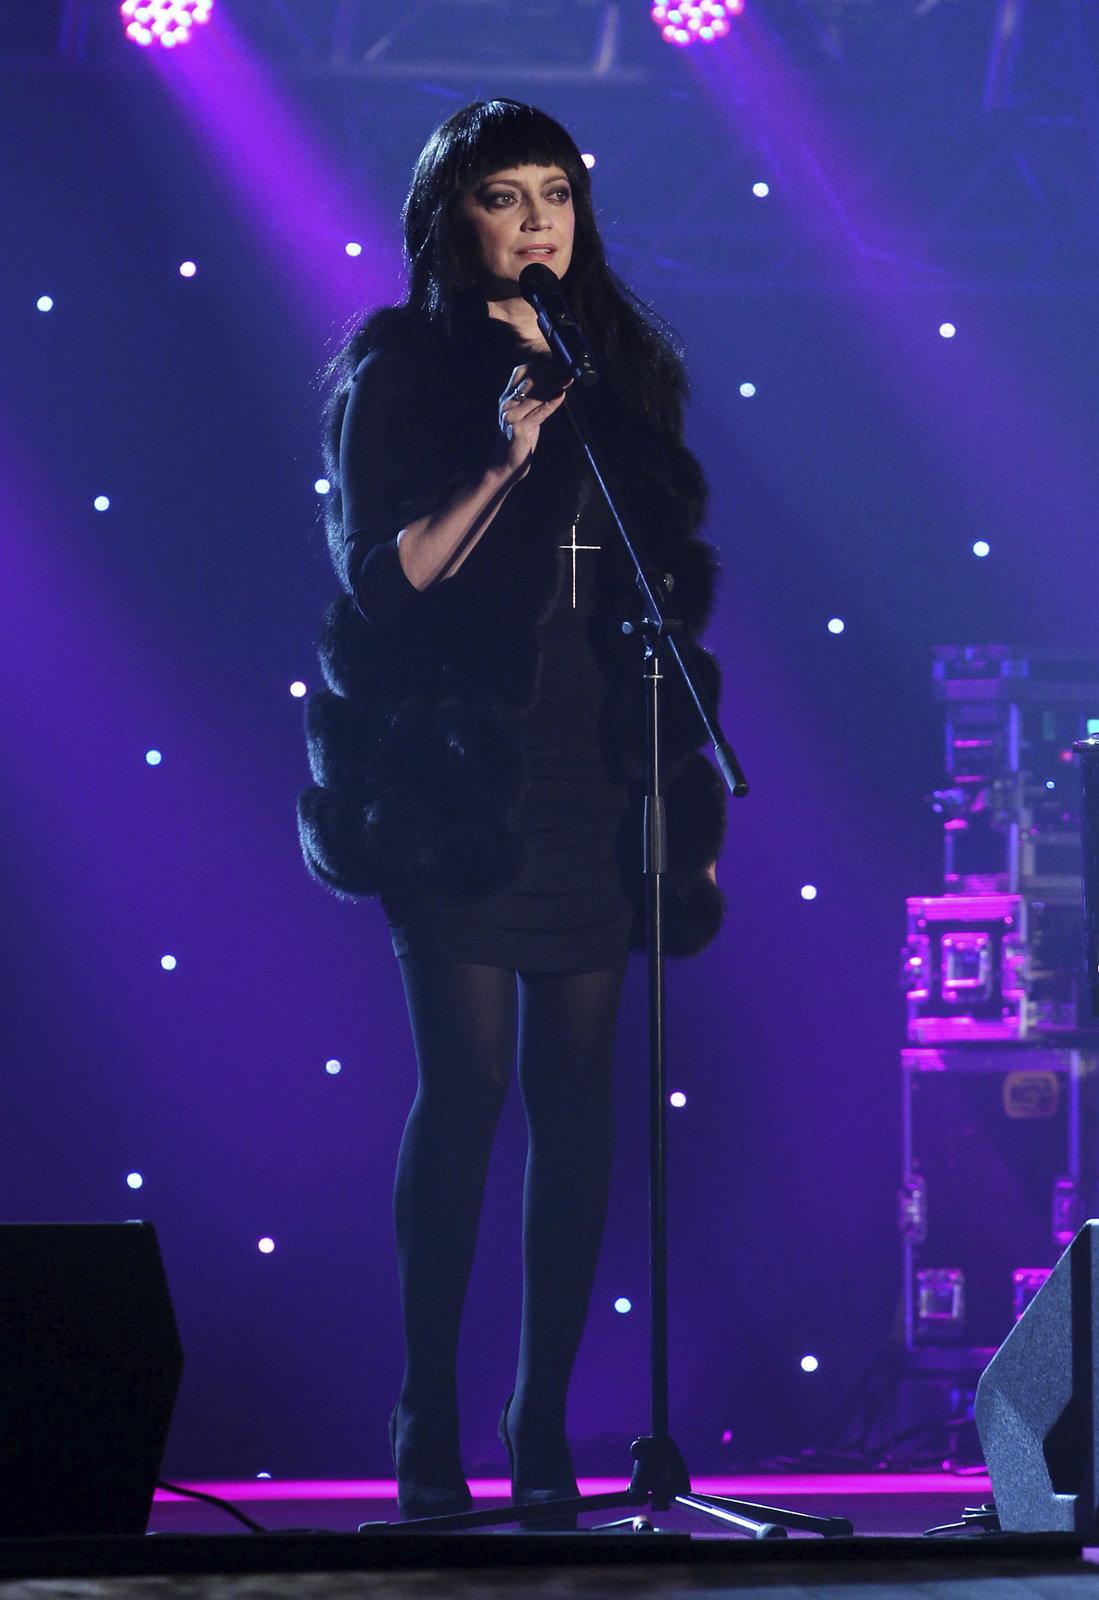 Lucie Bílá svým zpěvem znehodnotila práci Gábiny Osvaldové.